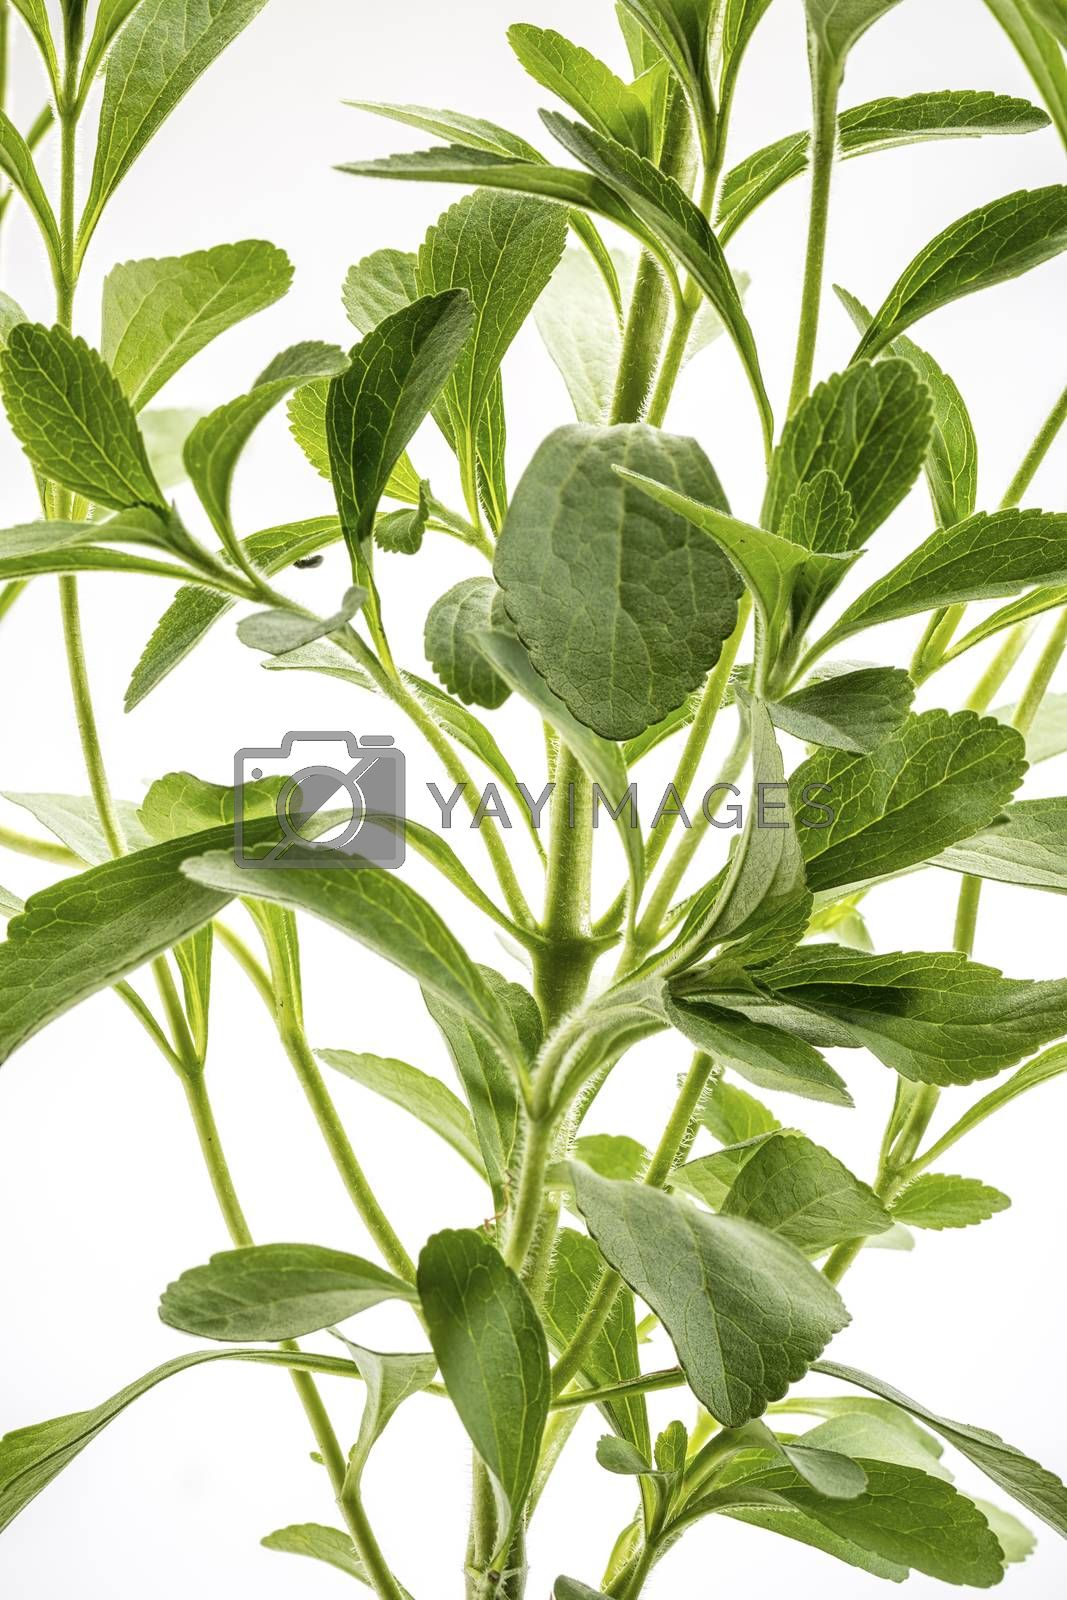 Stevia rebaudiana plant - alternative sweetener herb